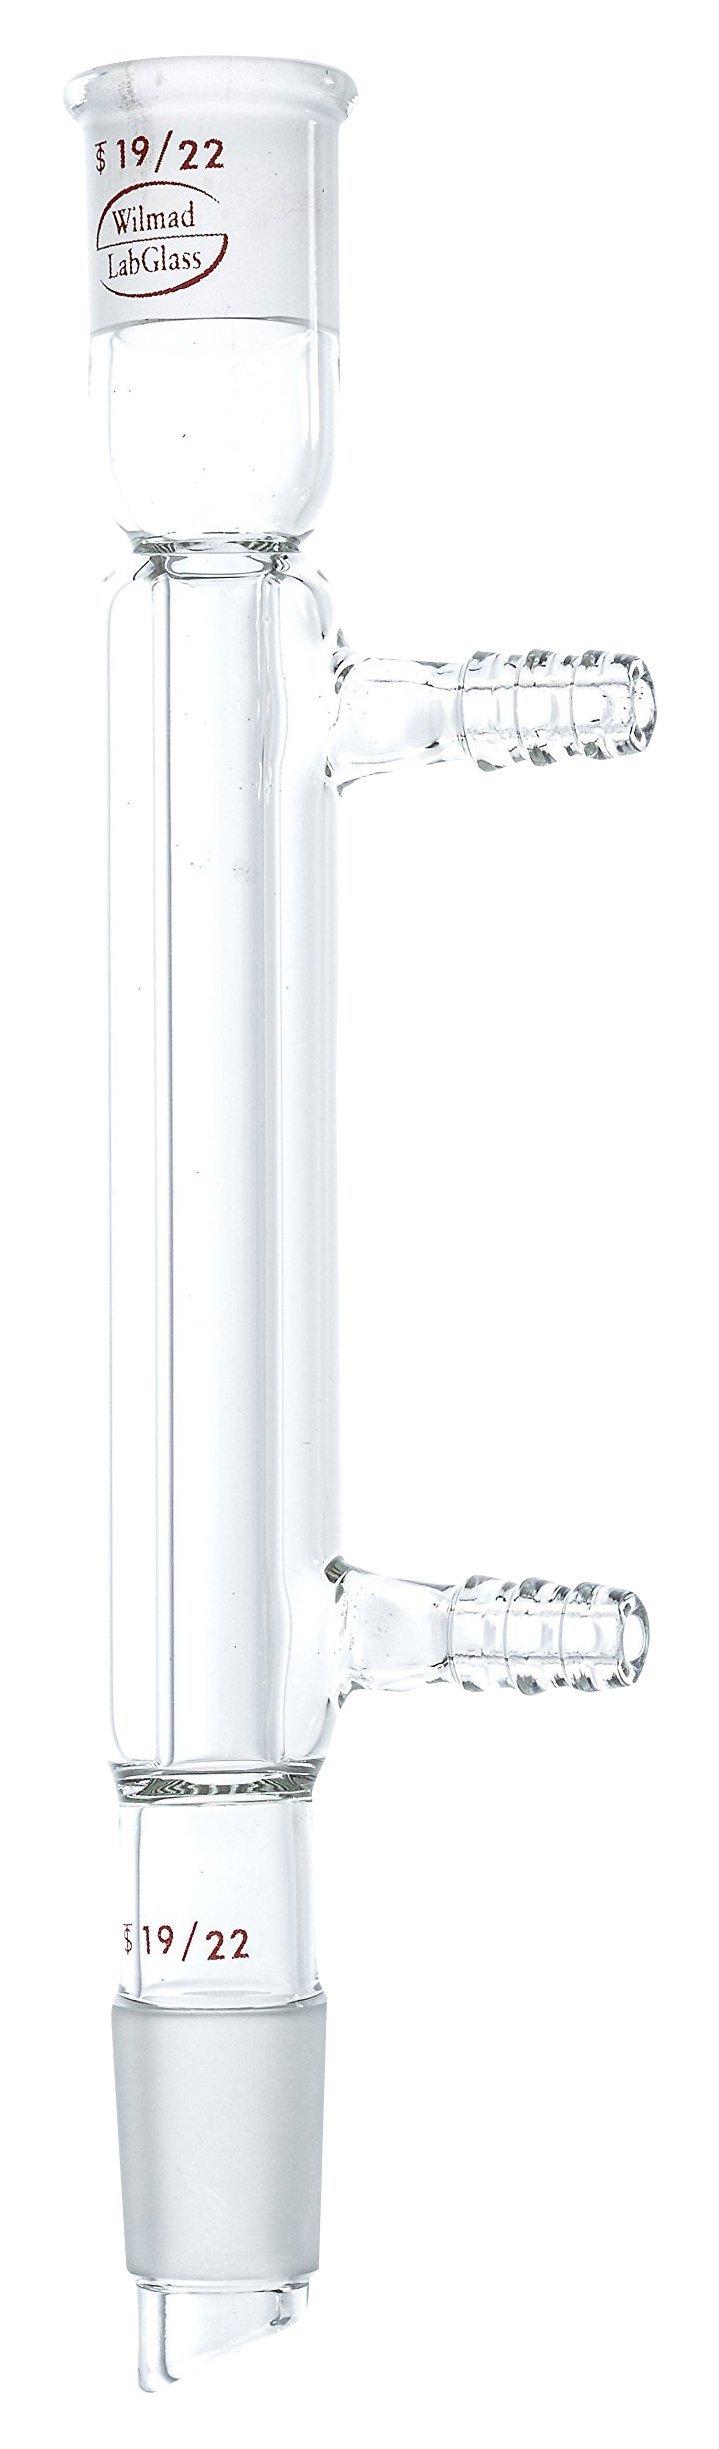 Wilmad-LabGlass ML-560-704 Liebeg Condenser, Standard Taper 19/22, 110mm Jacket Length